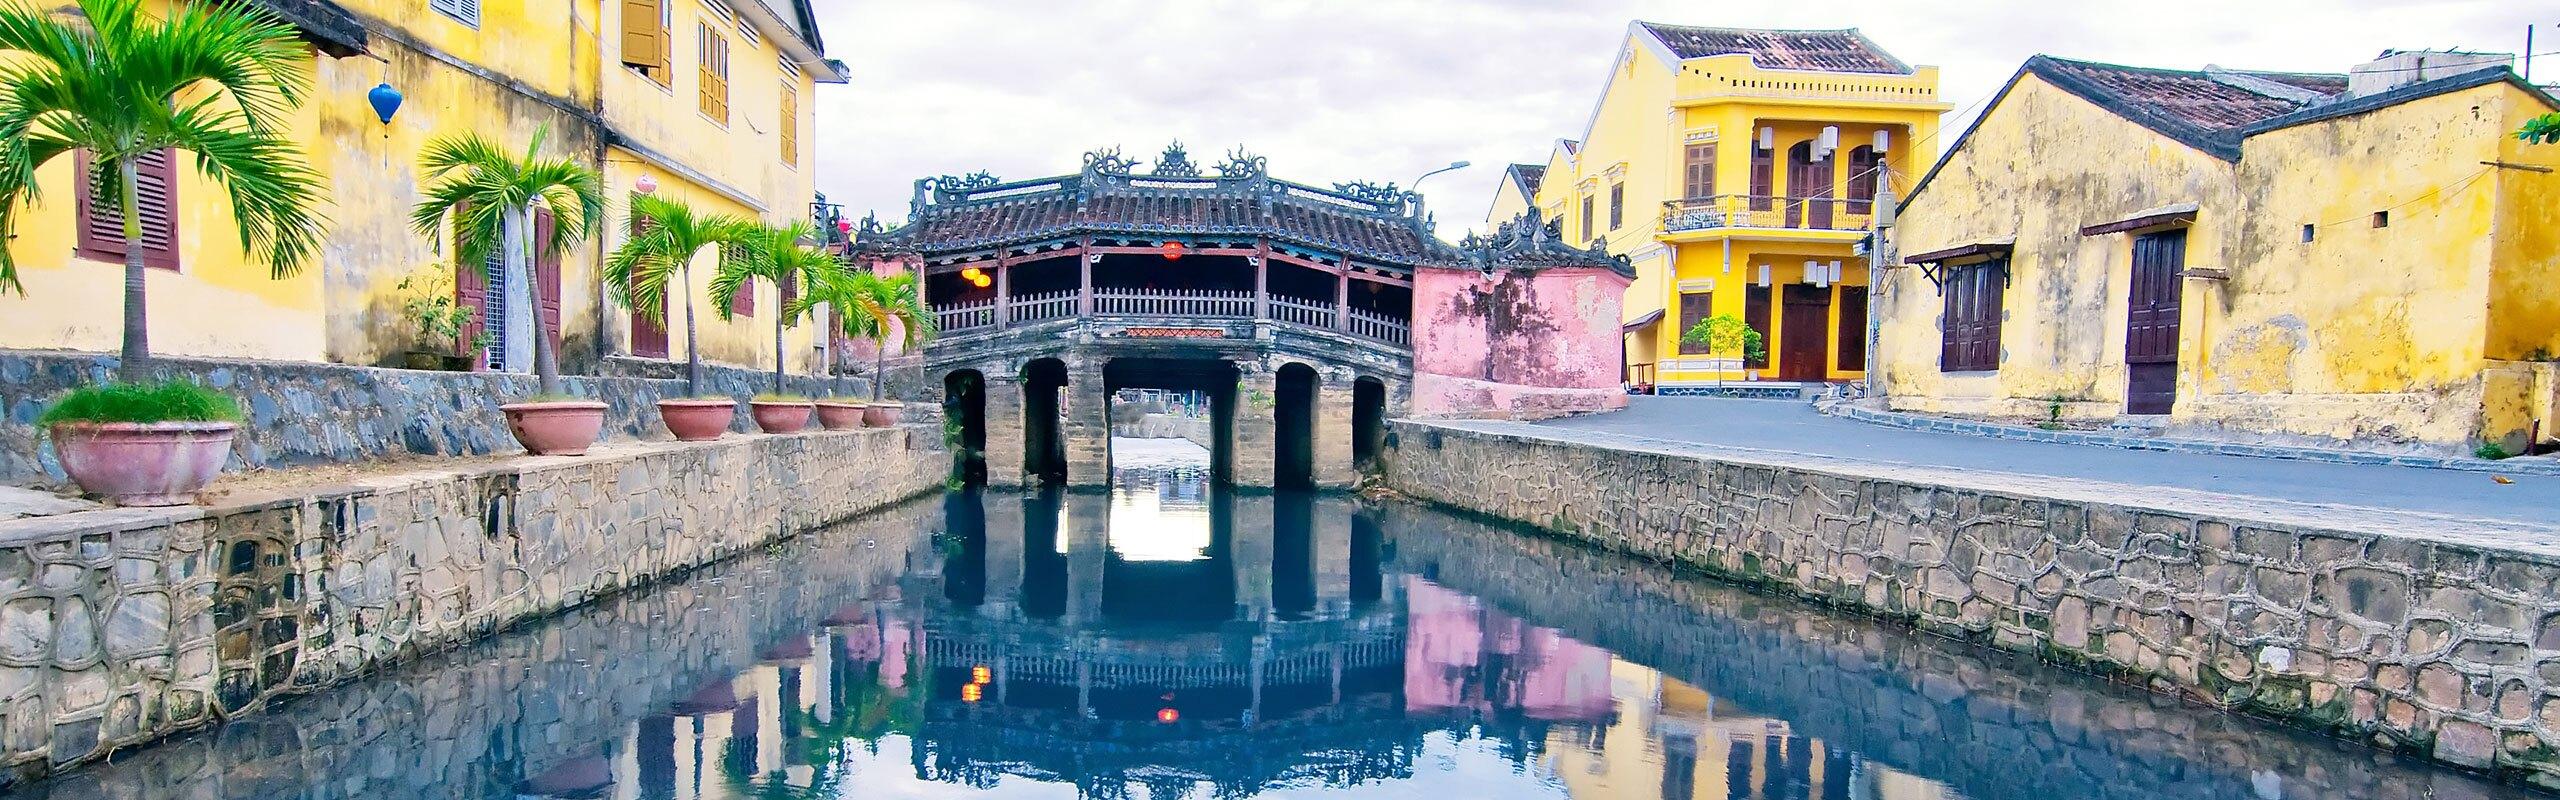 10-Day Best of Vietnam with Mekong Delta